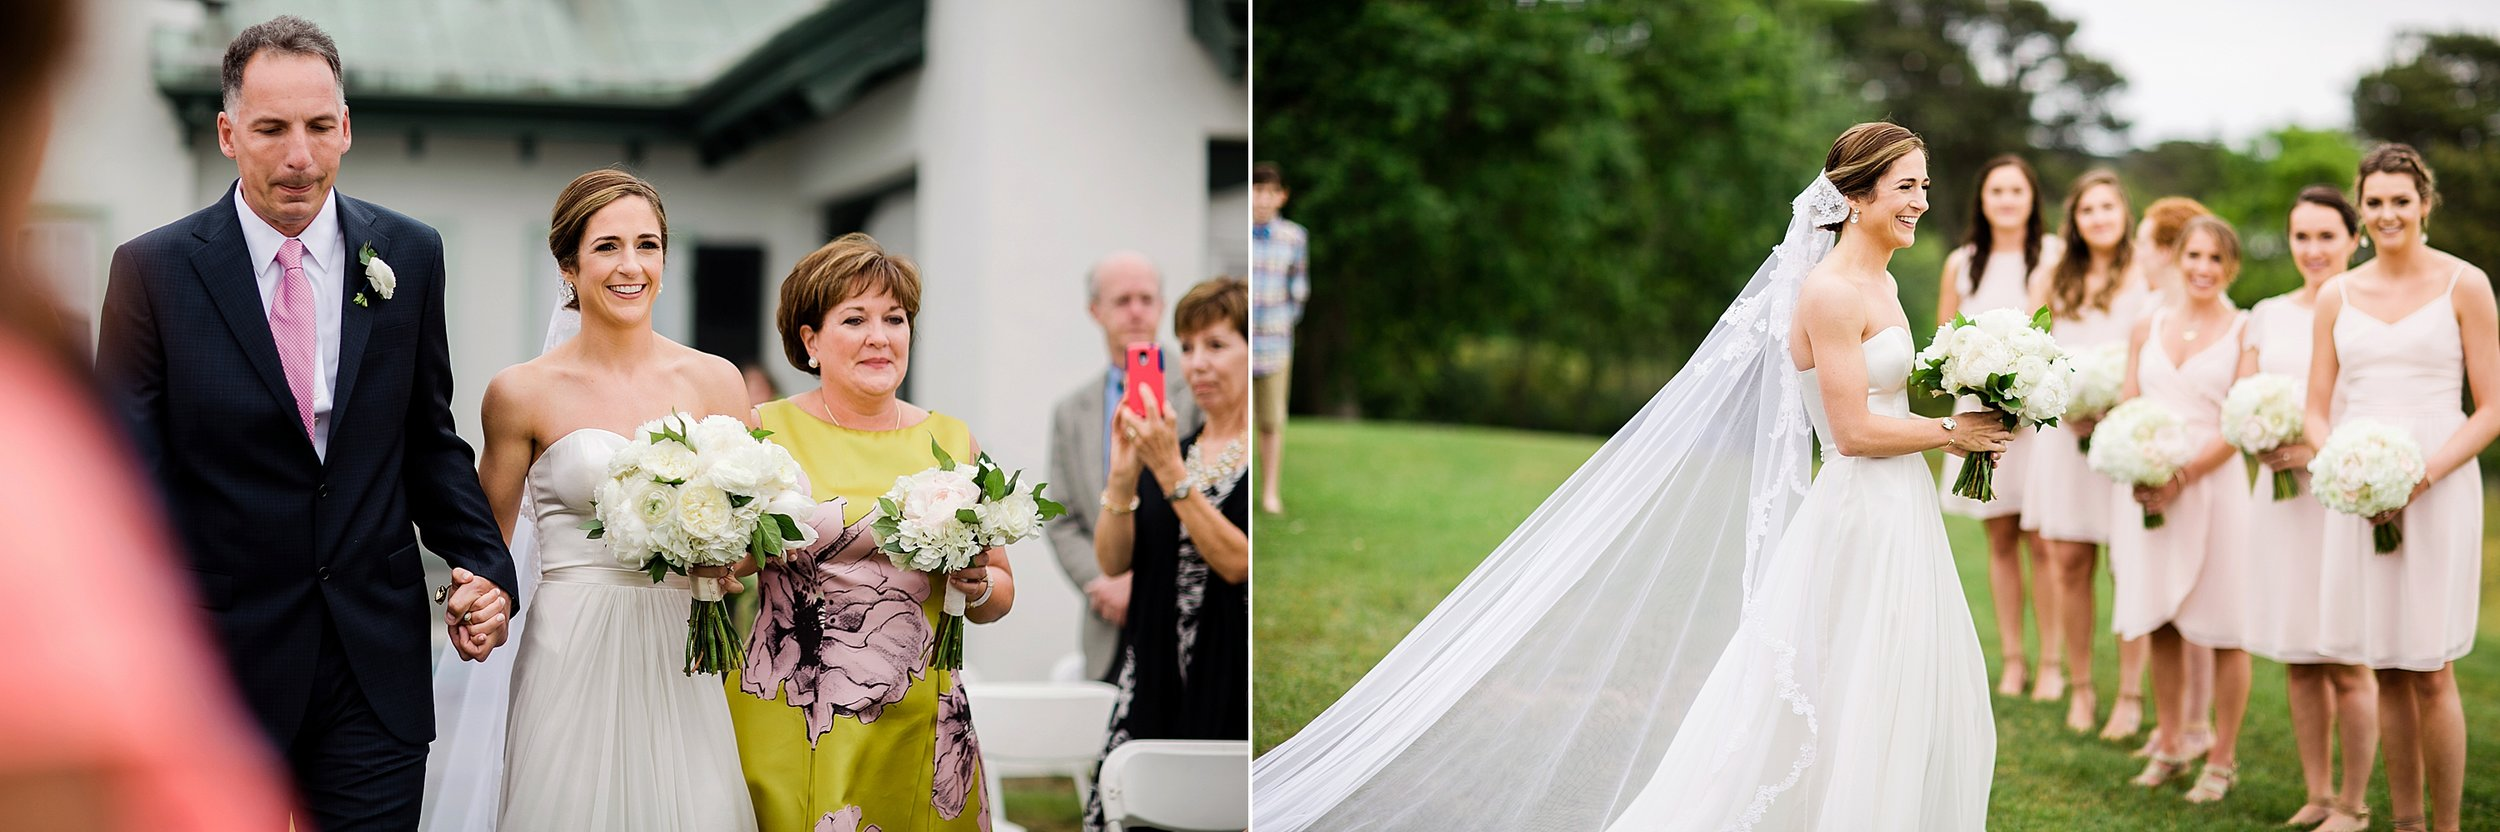 032 los angeles wedding photographer todd danforth photography cape cod.jpg